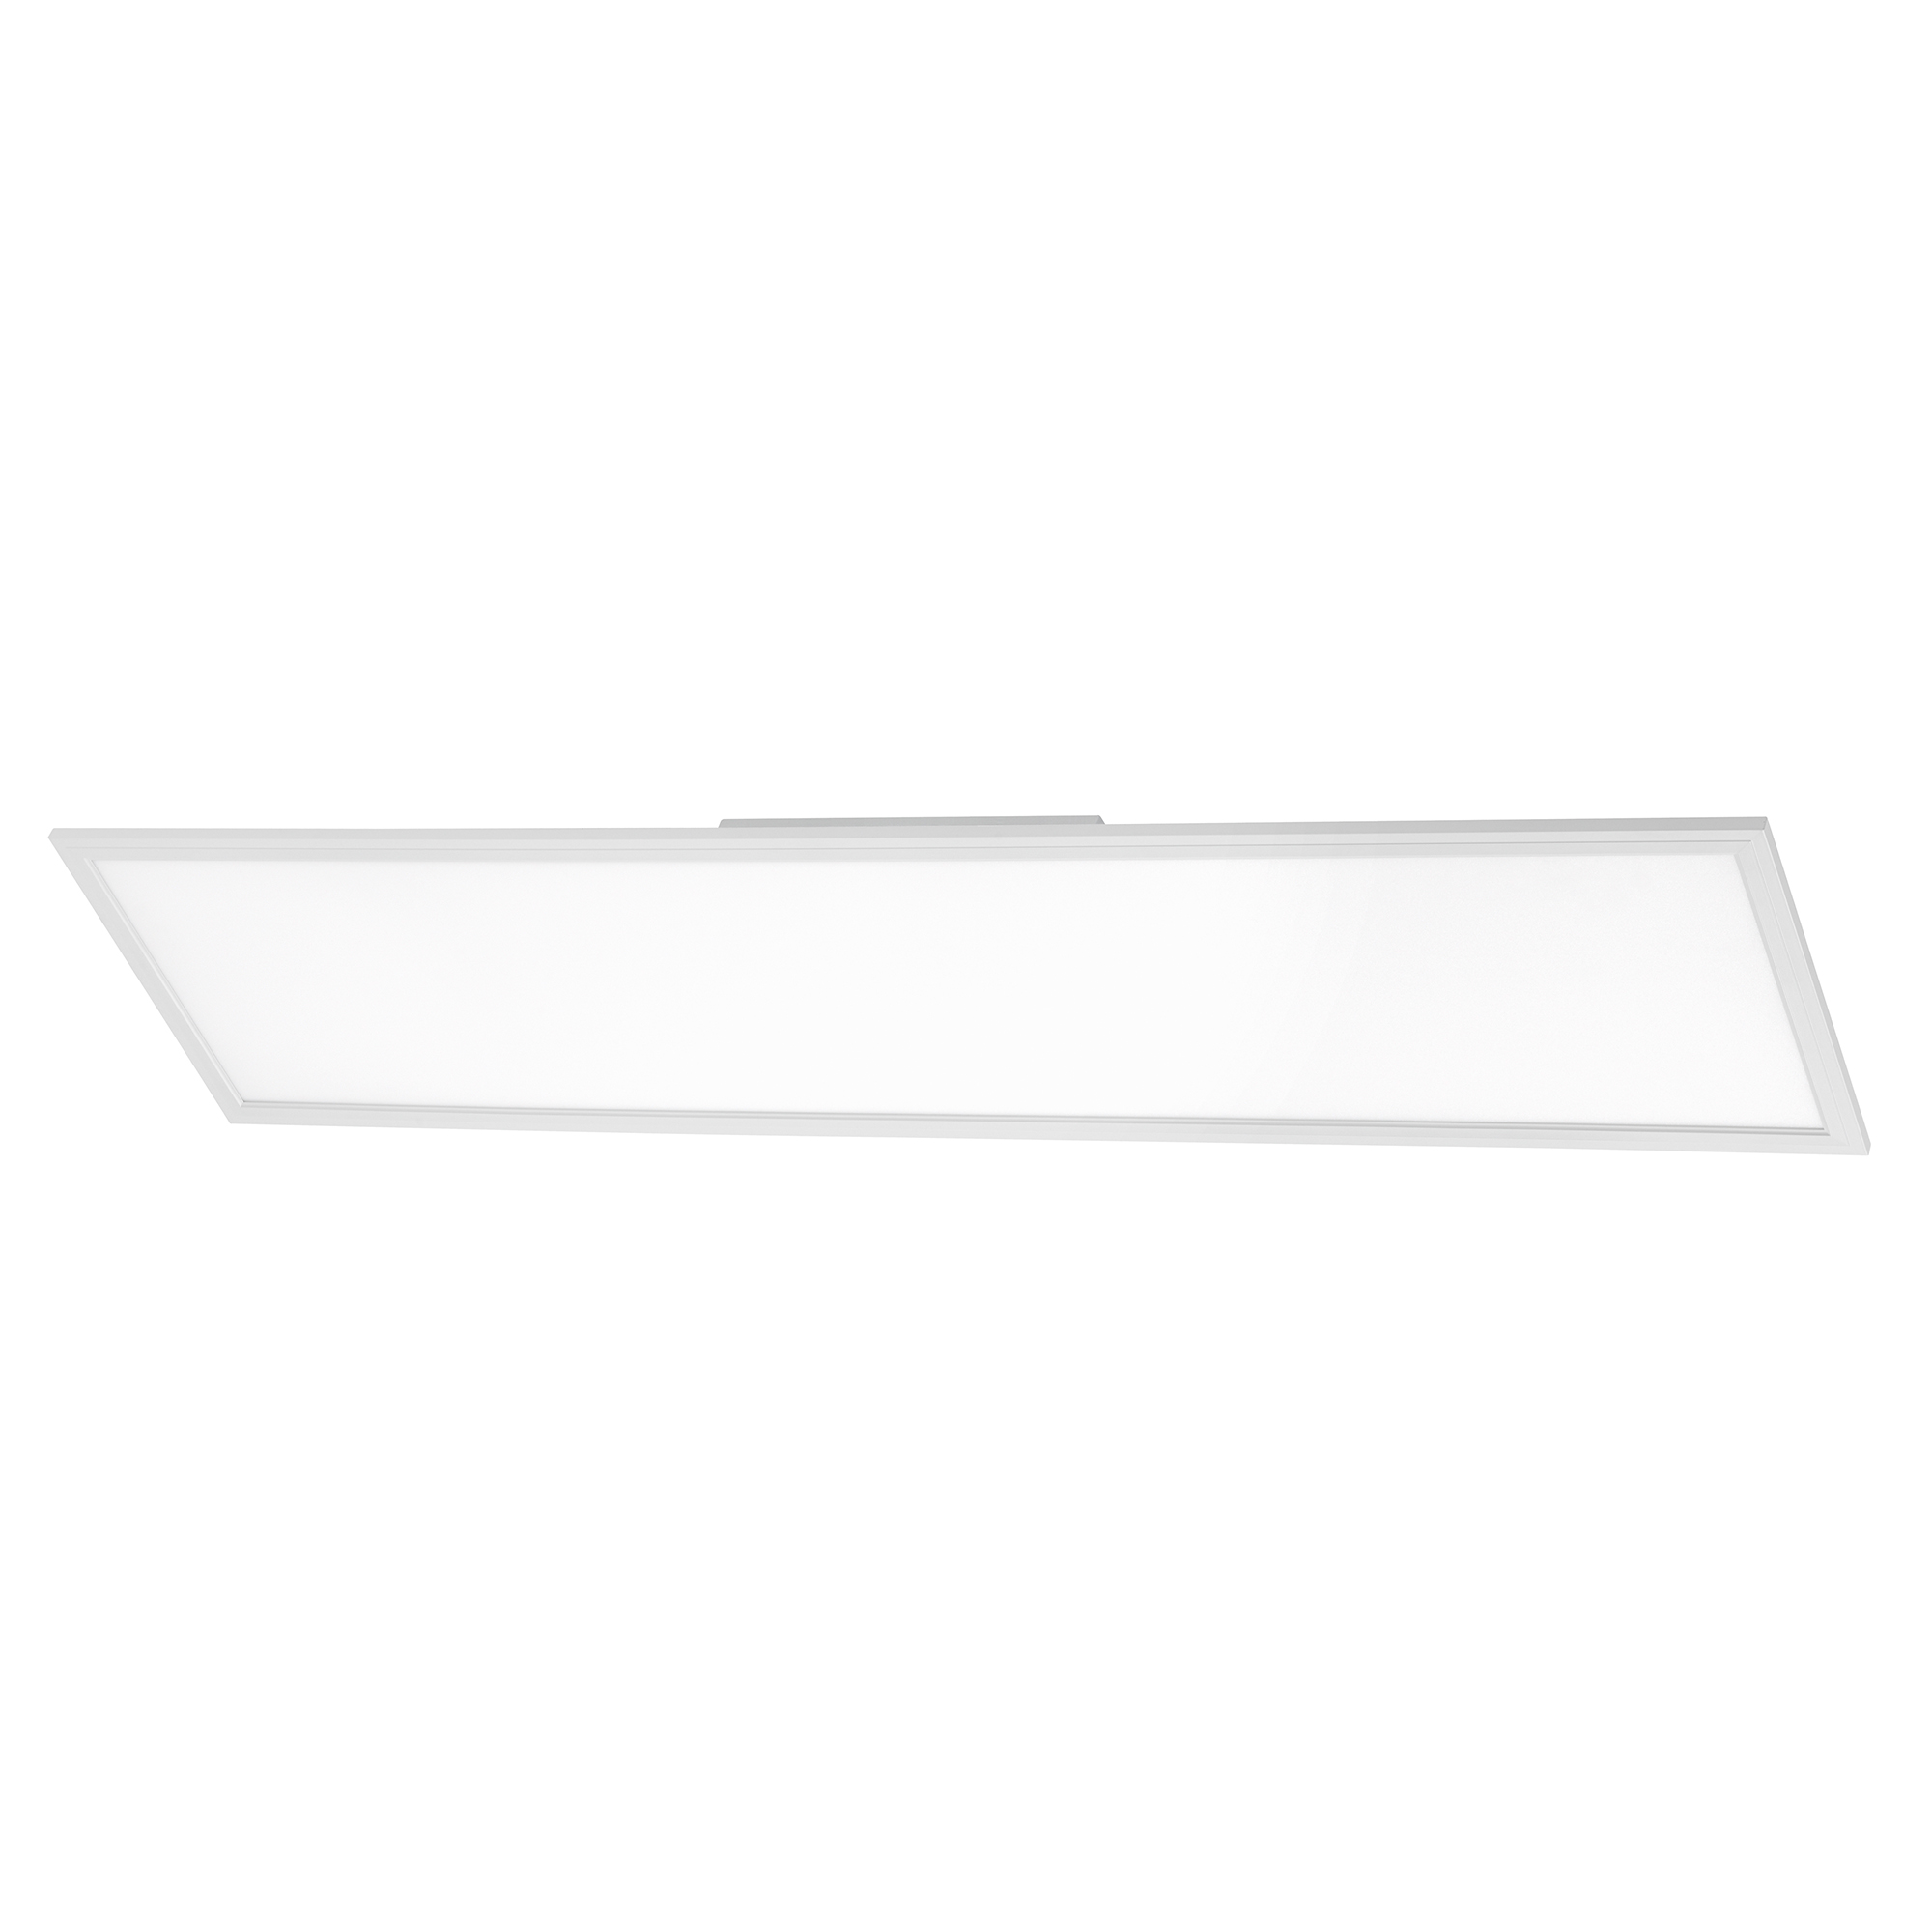 LED Panel, 119,5 cm, 4100 LUMEN, 38 WATT, Weiss